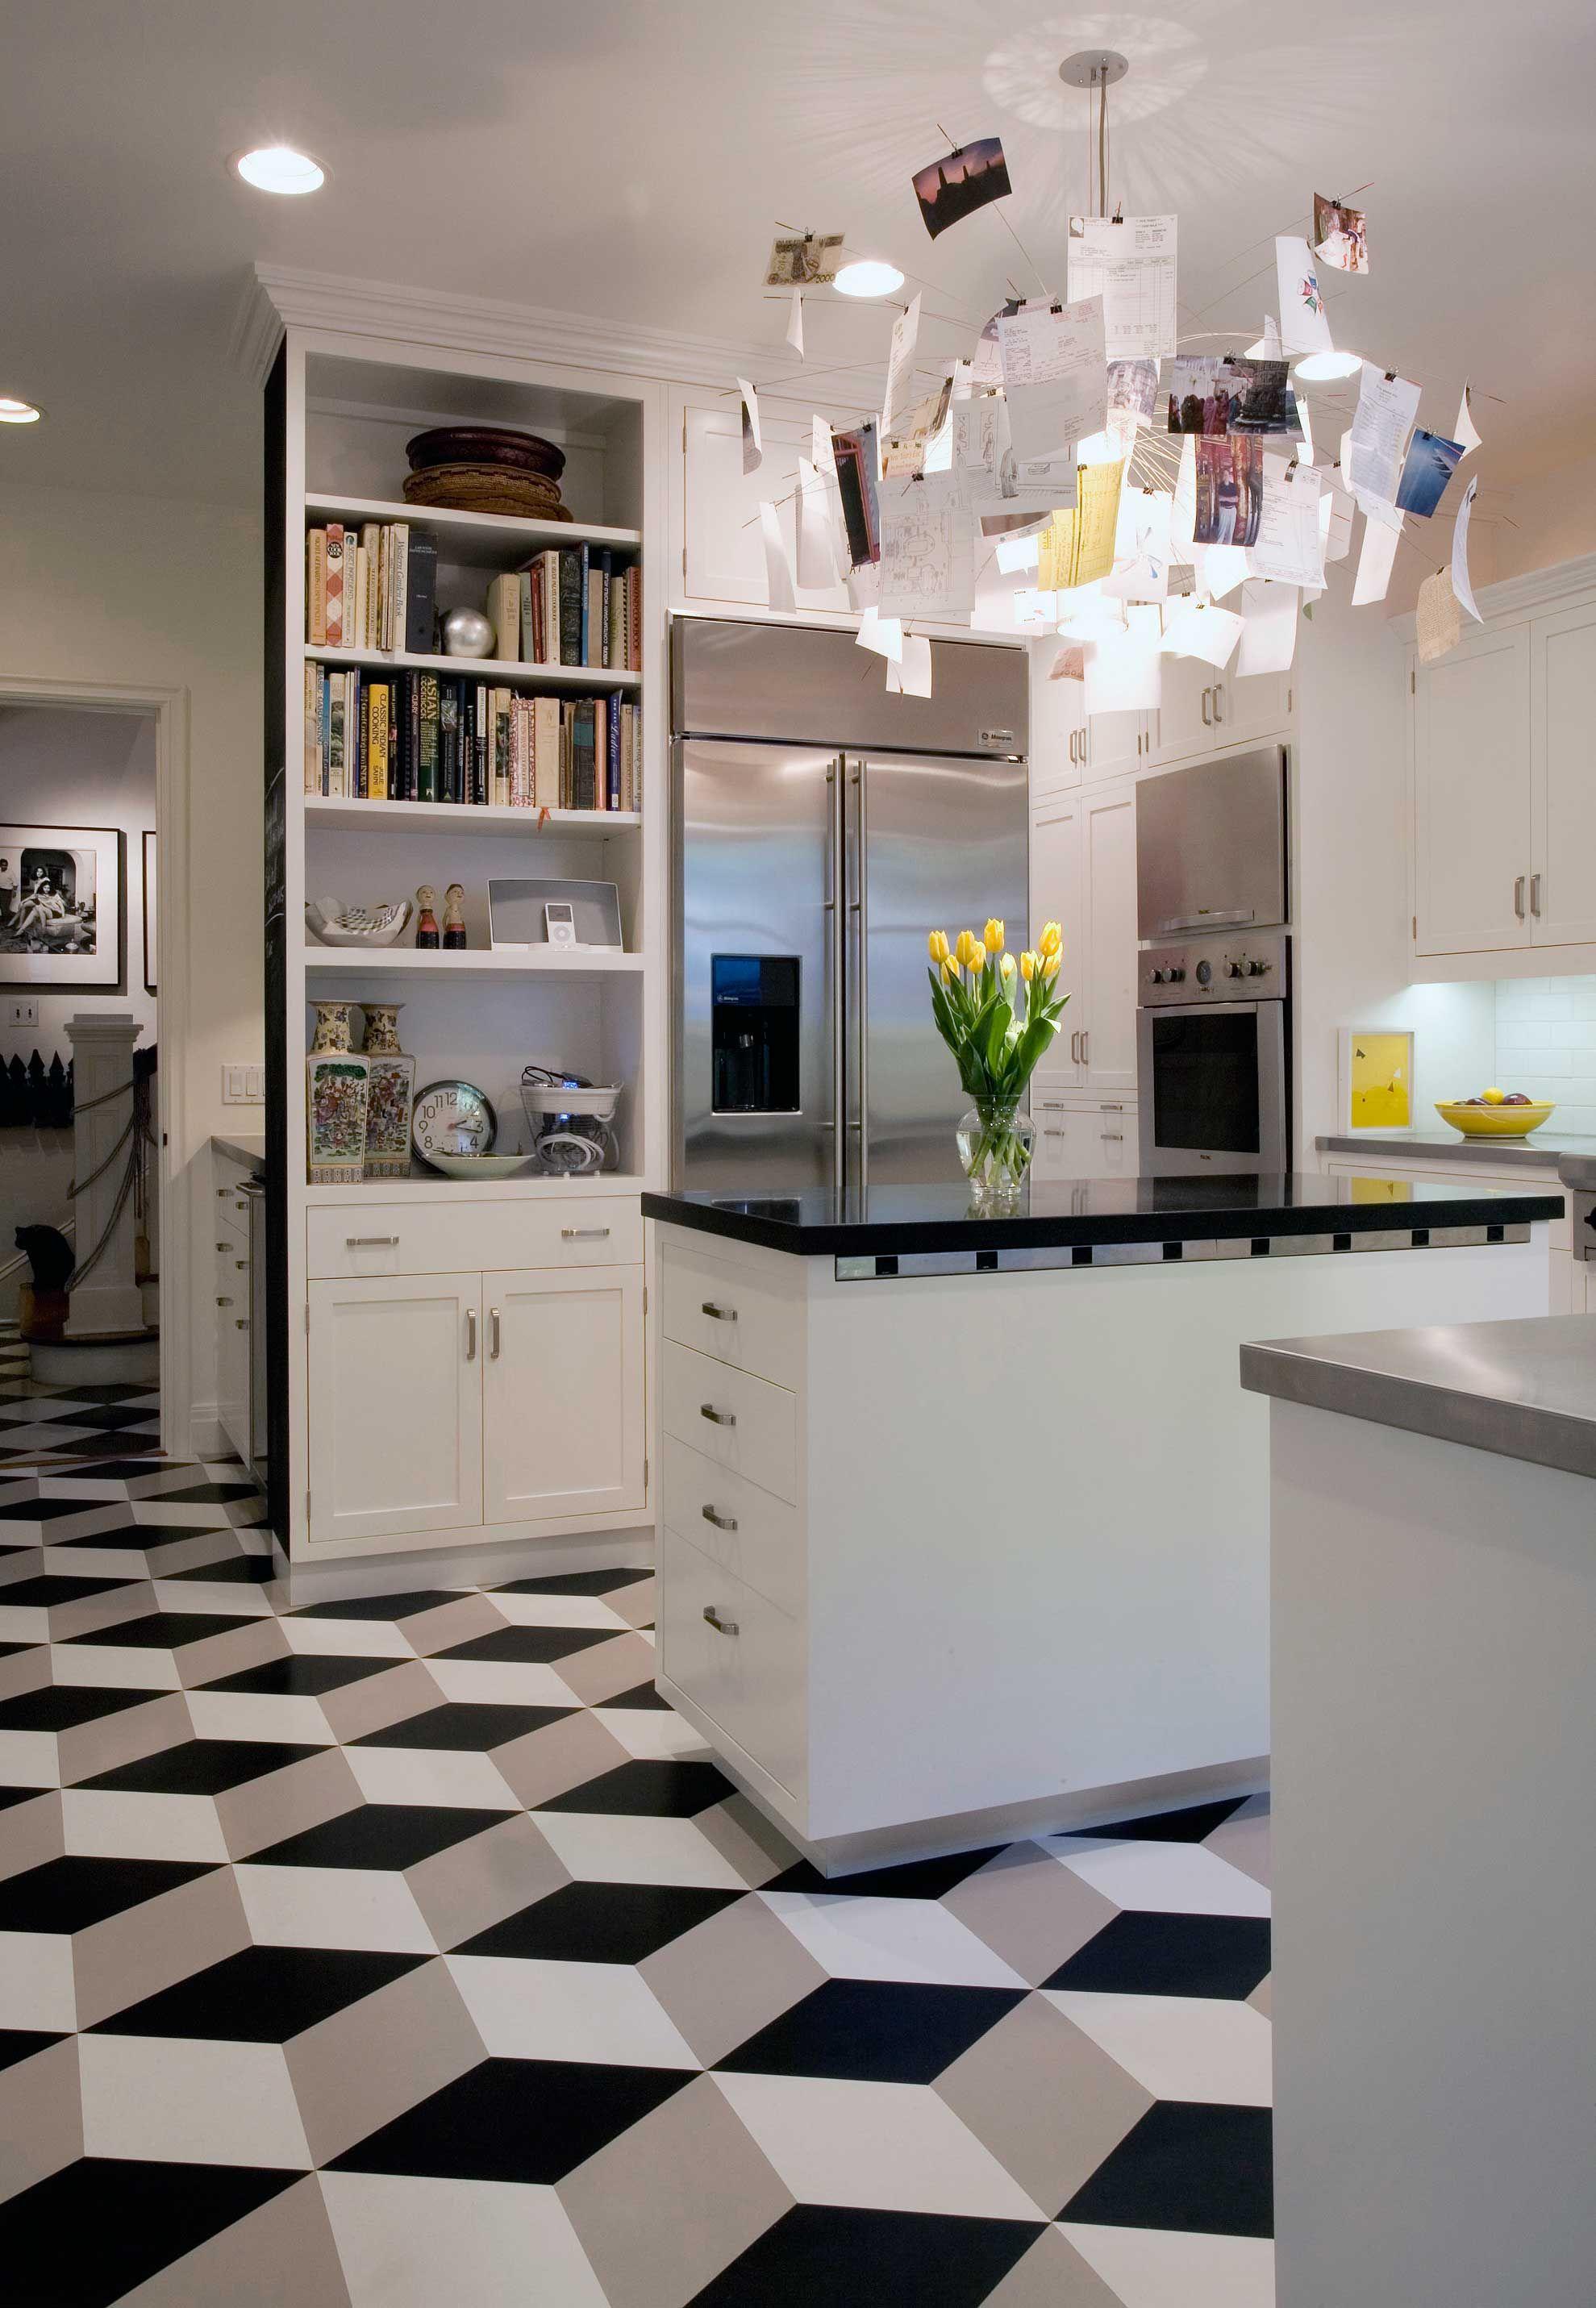 Crogan Inlay Floors 10 10 Inlay Flooring Linoleum Kitchen Floors Interior Design Kitchen